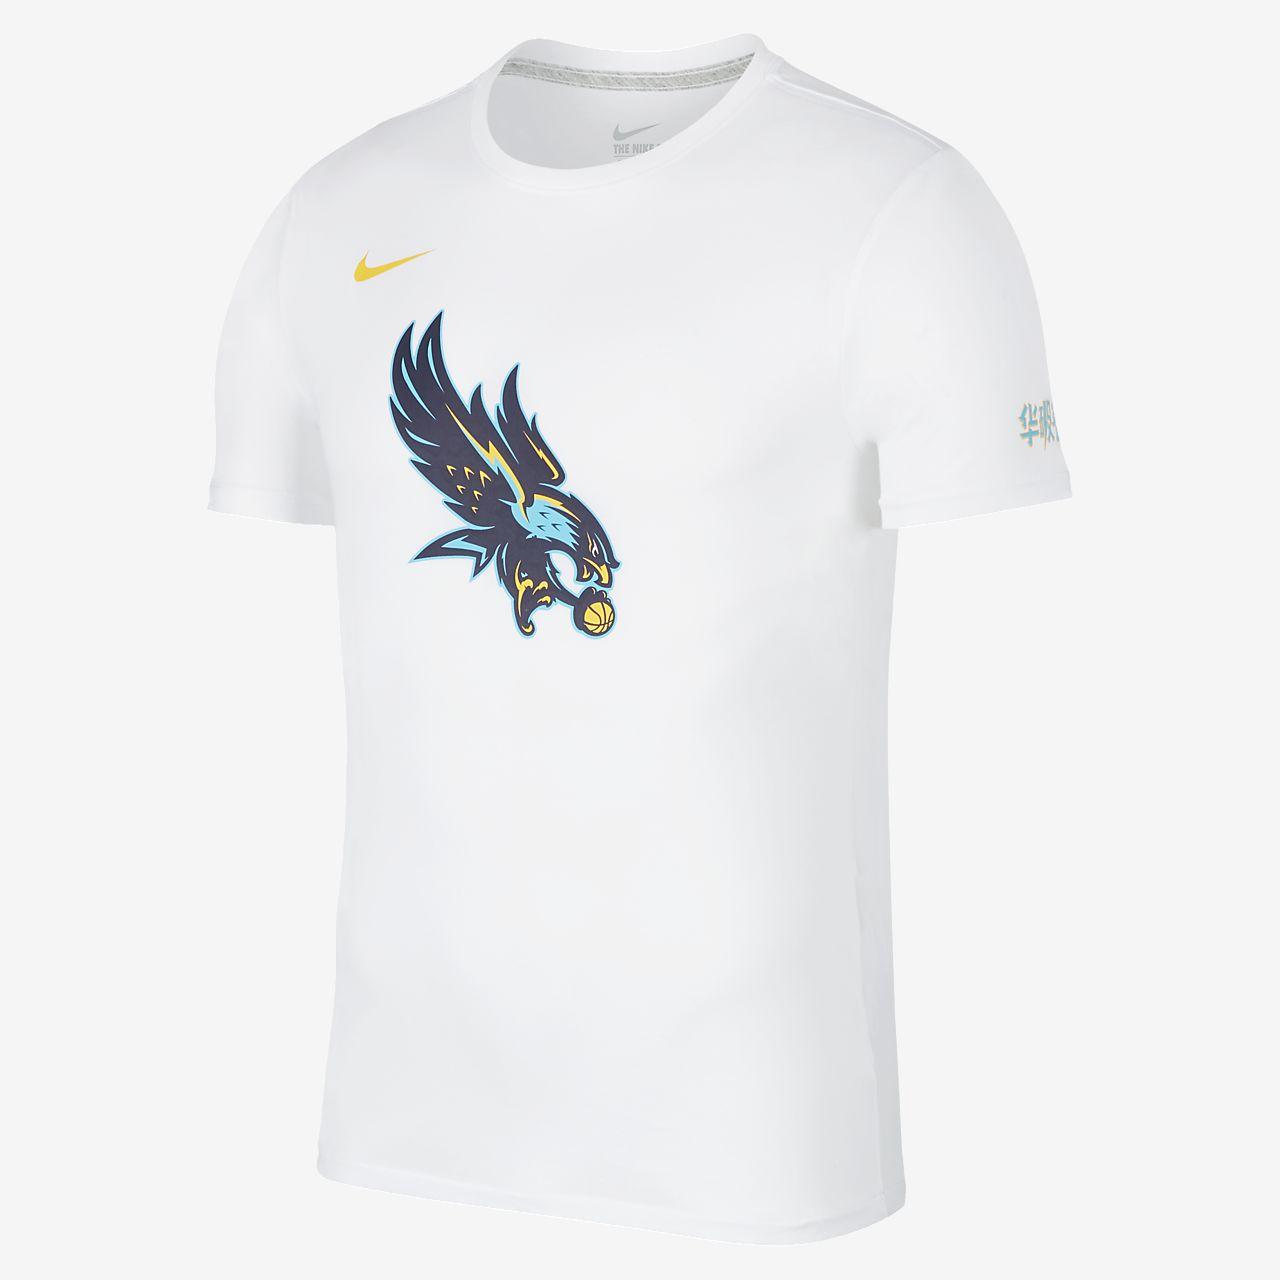 Nike 2019 HBL Shanghai HMZX 耐克高中篮球联赛男子篮球T恤